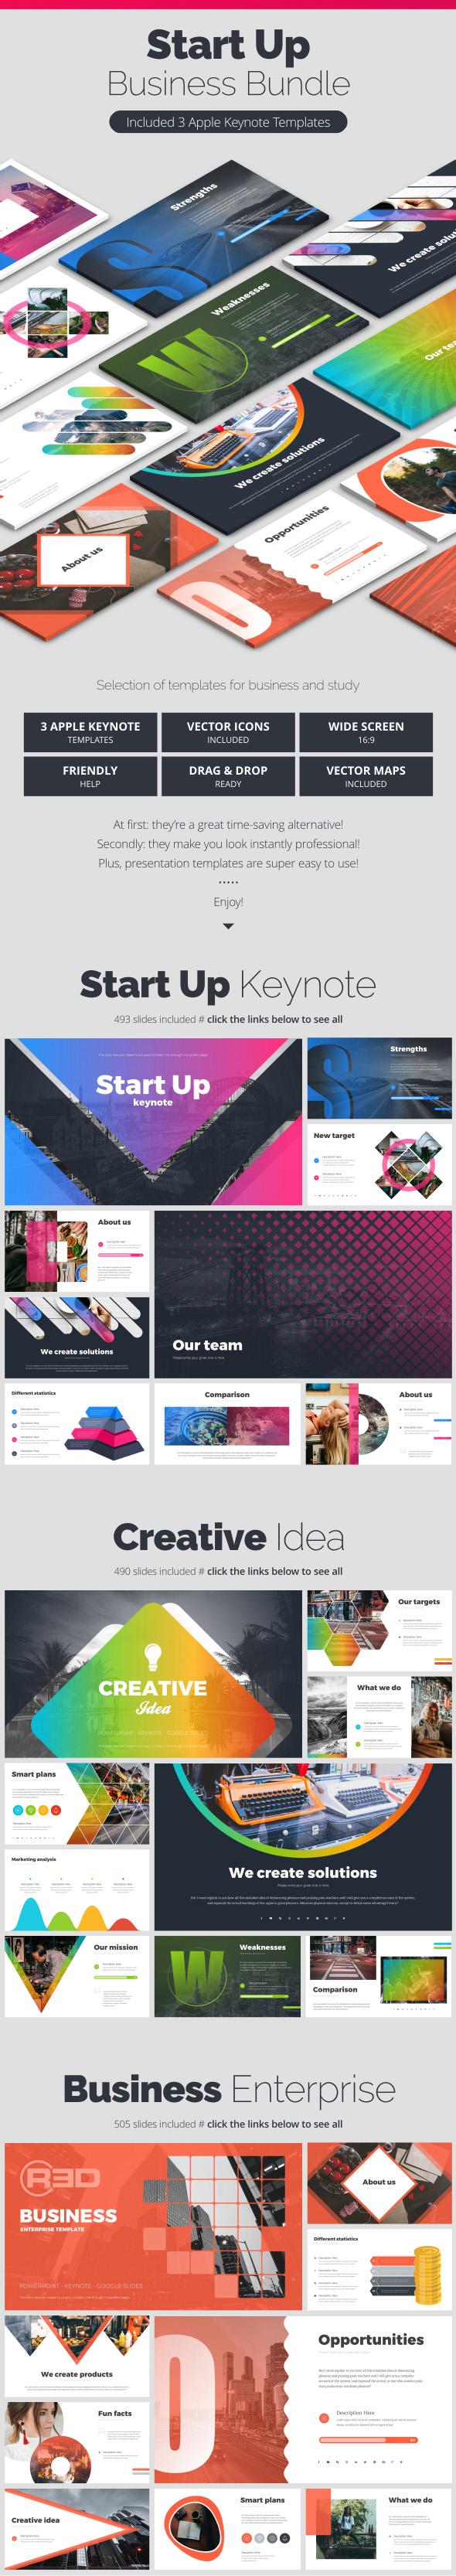 StartUp Bundle - Business Keynote Templates